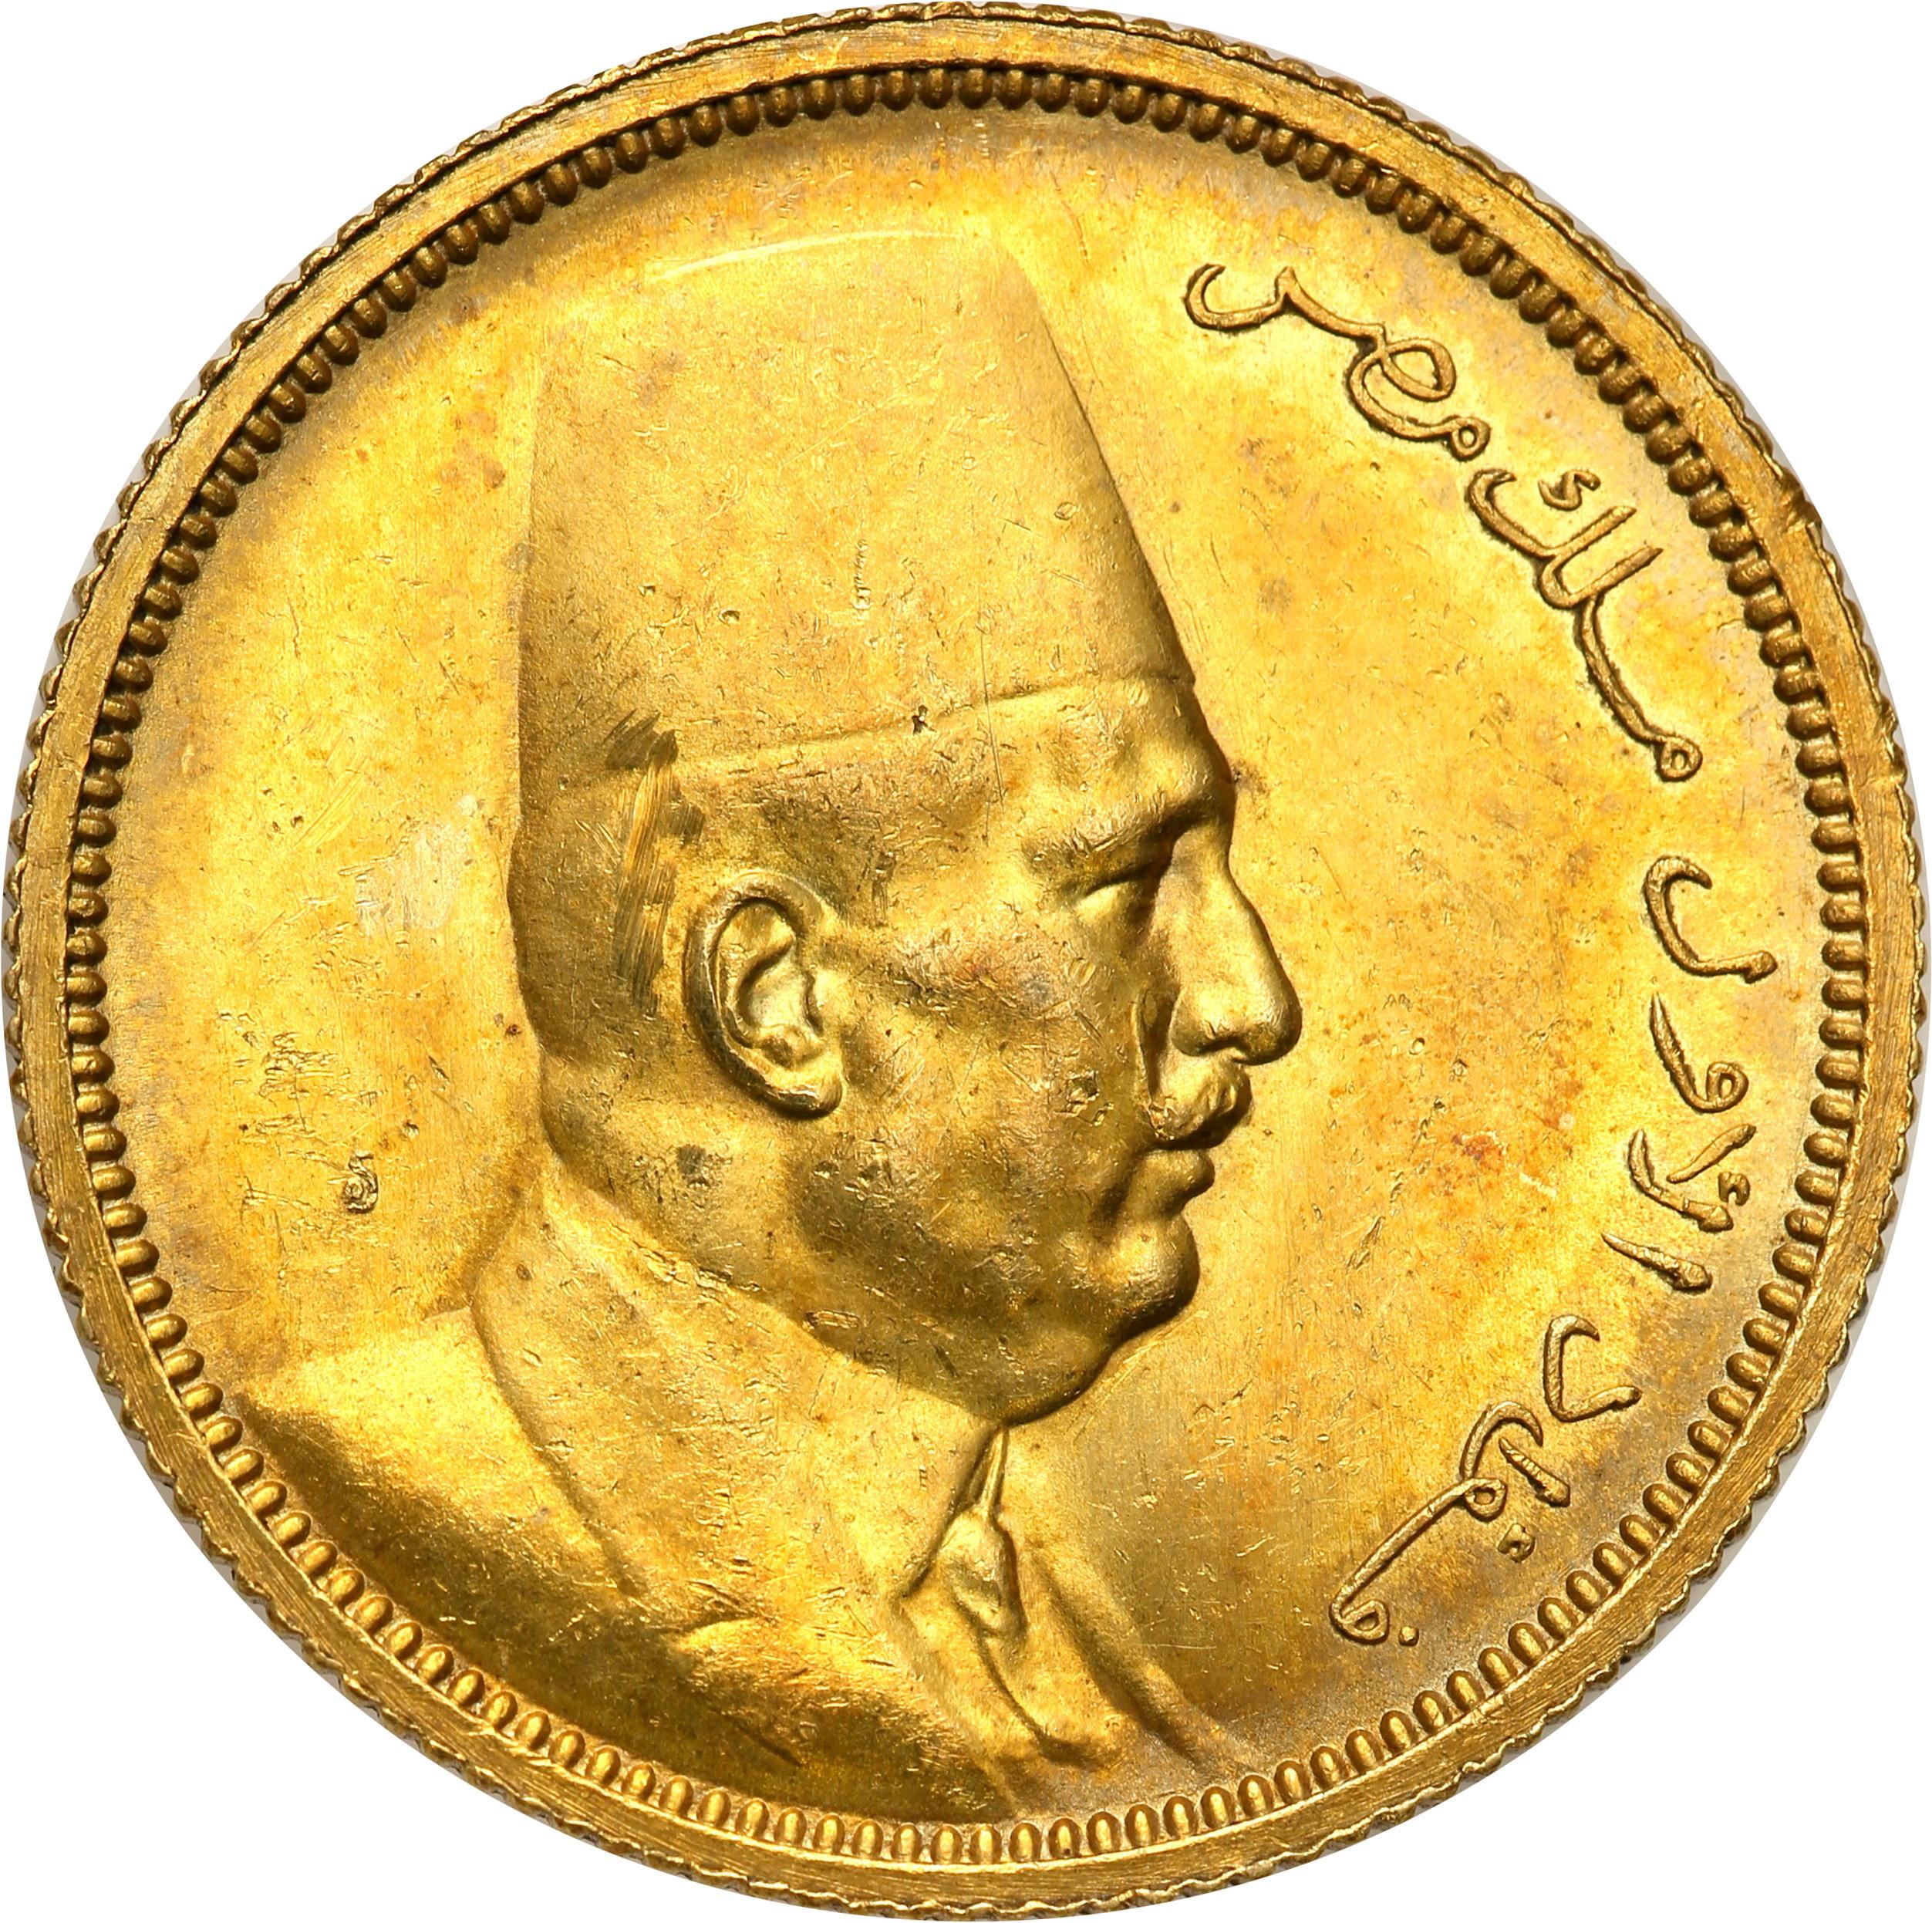 Egipt. 100 Piastrów 1922 Yellow gold st.1